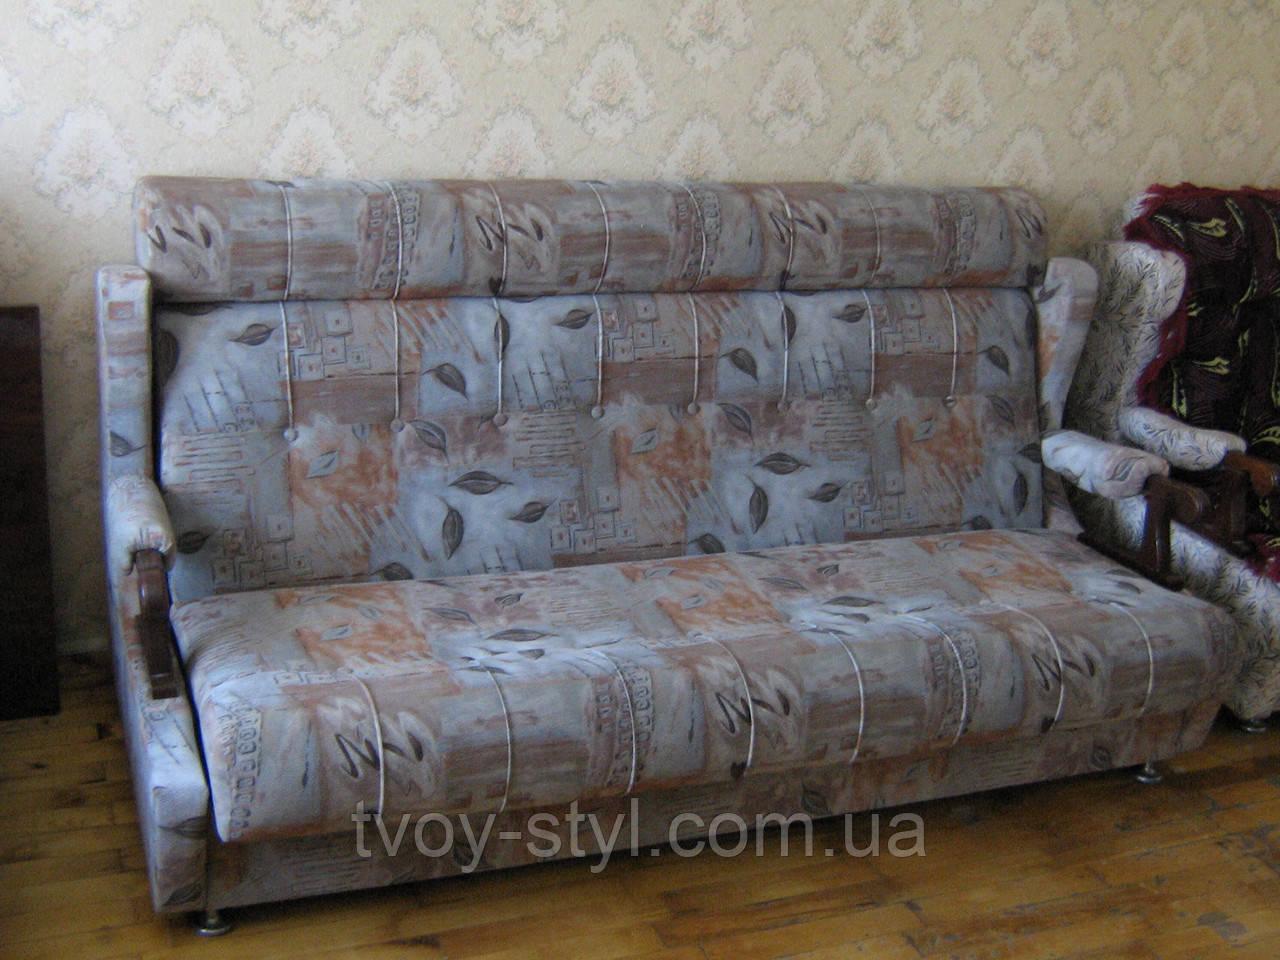 Перетяжка мягкой мебели денепропетровск